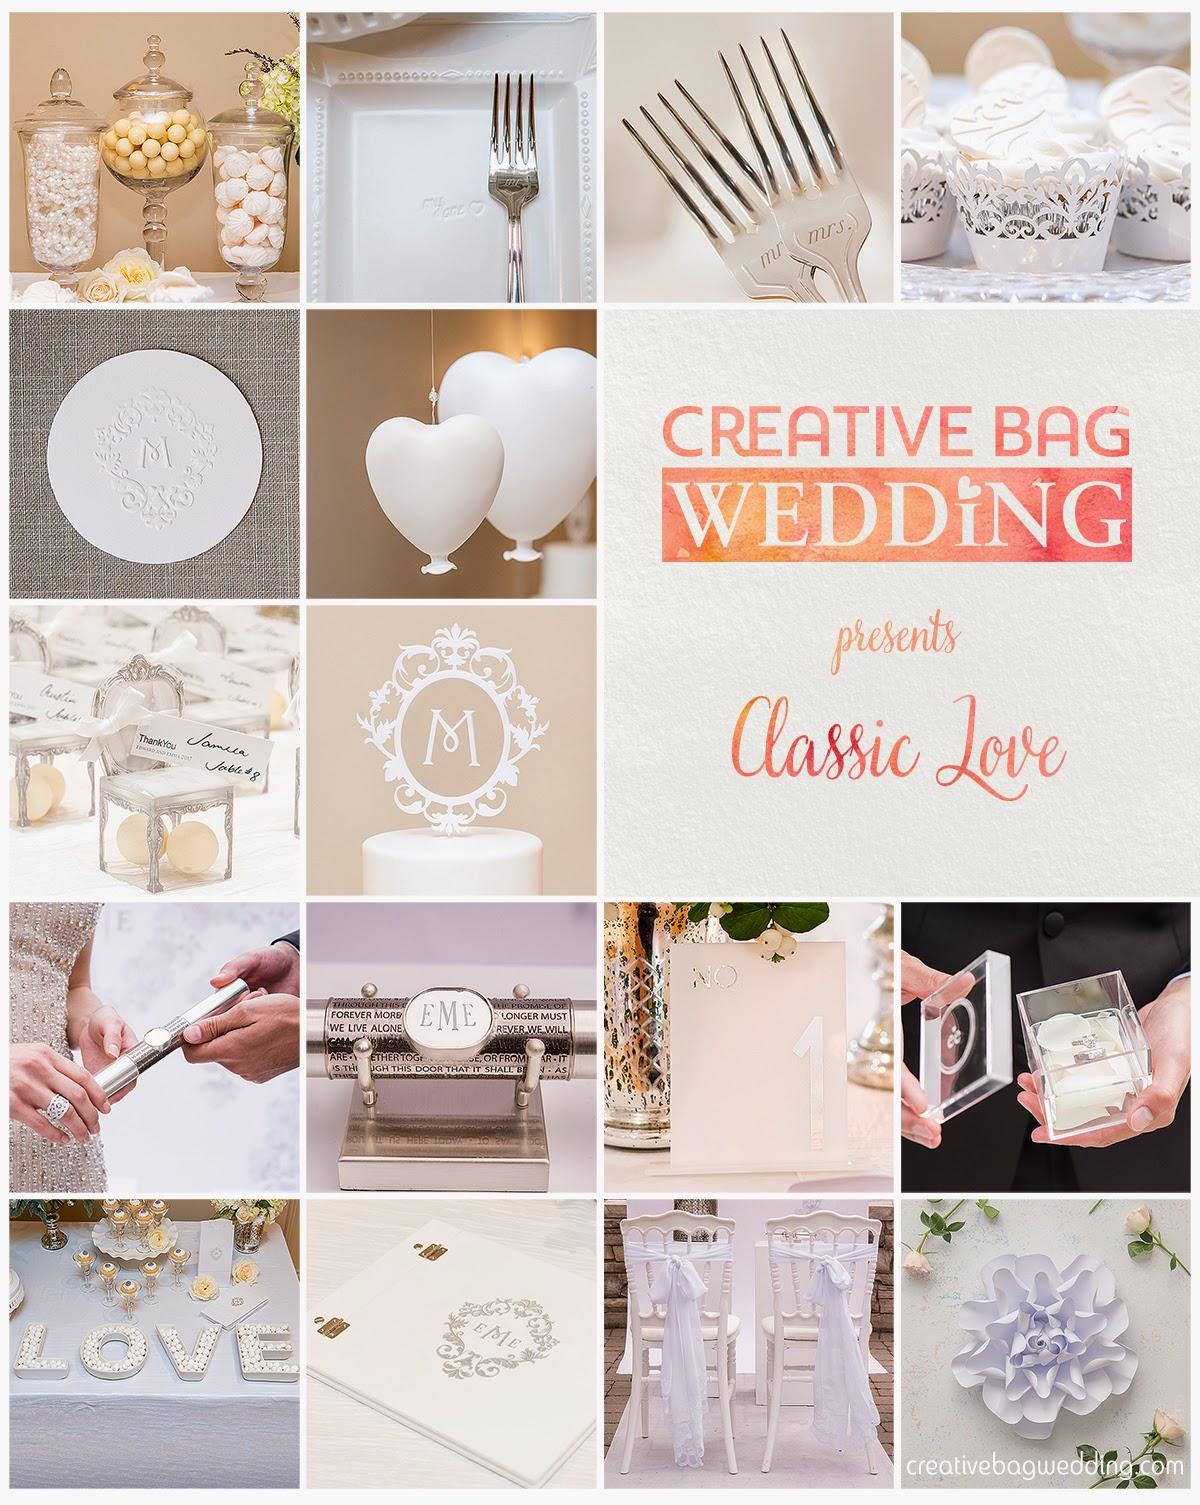 classic love mood boards | Creative Bag Wedding